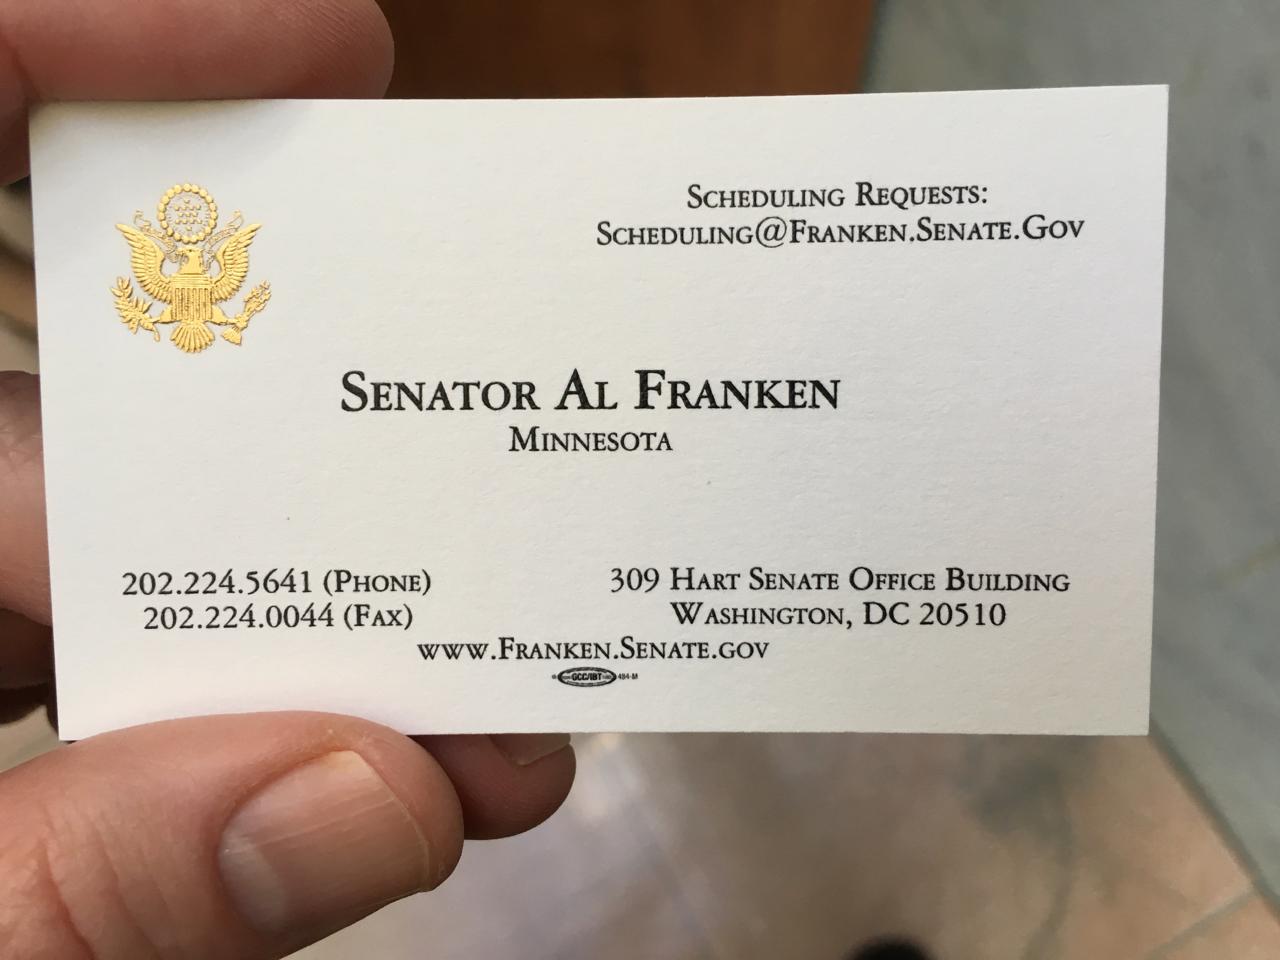 Al Franken's card